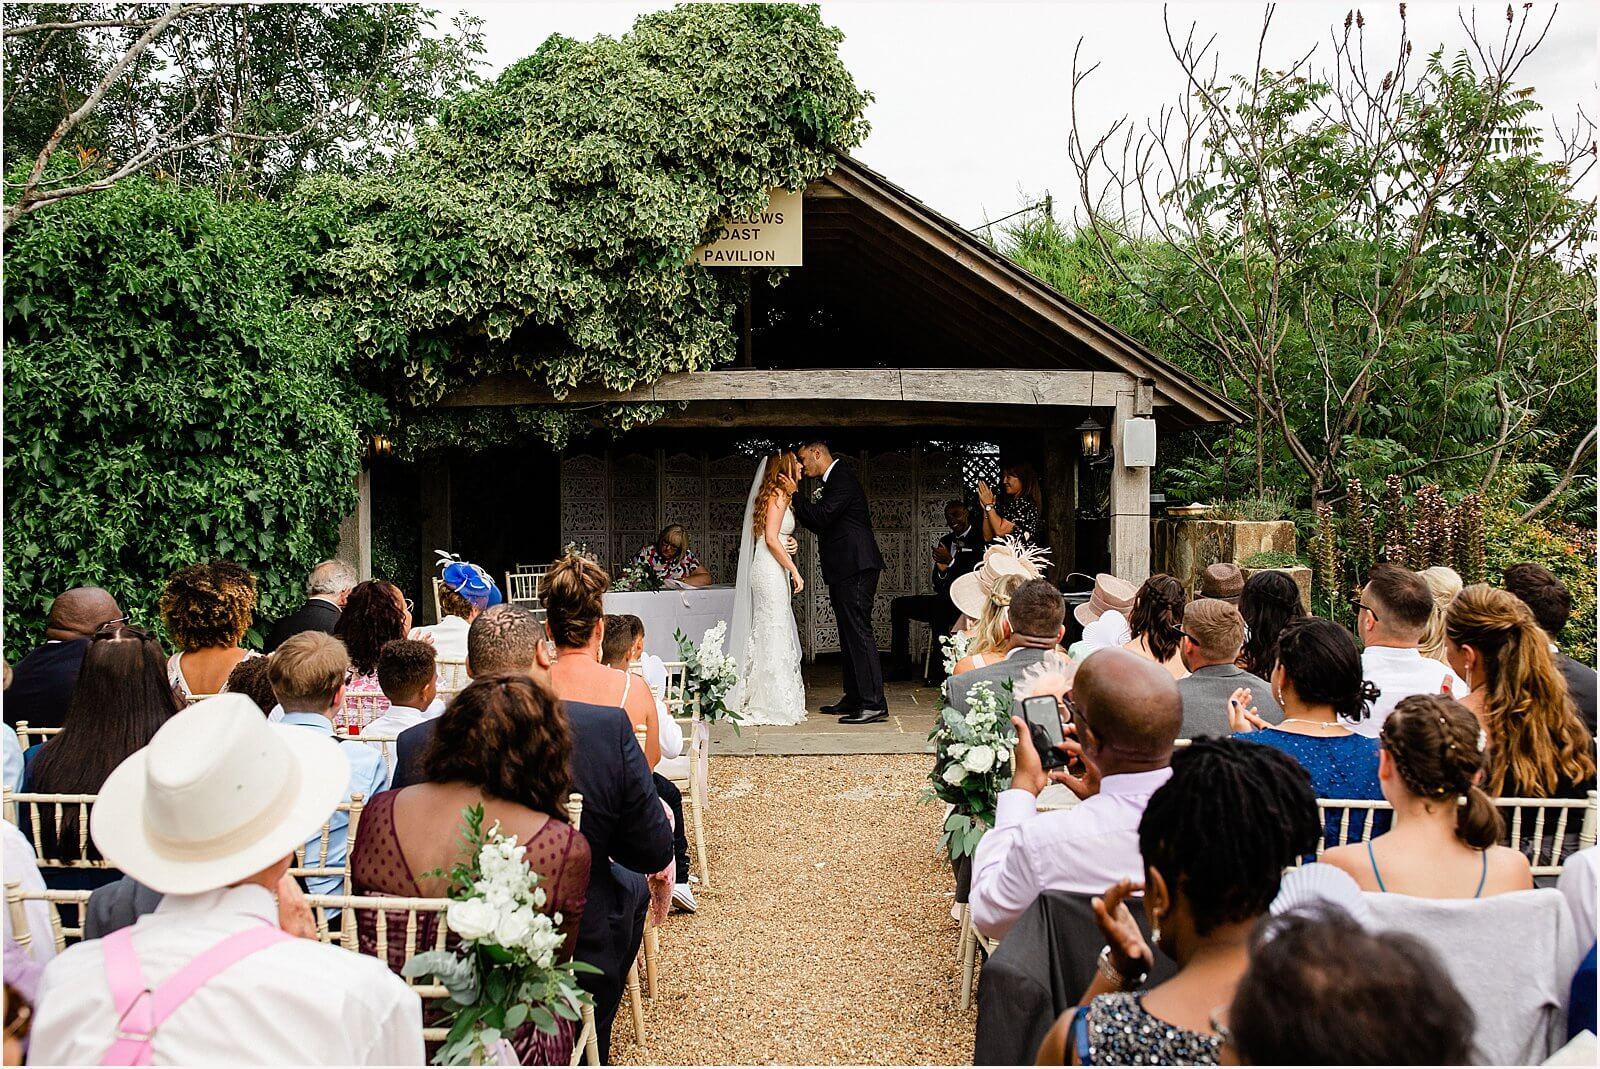 Swallows Oast Weddings